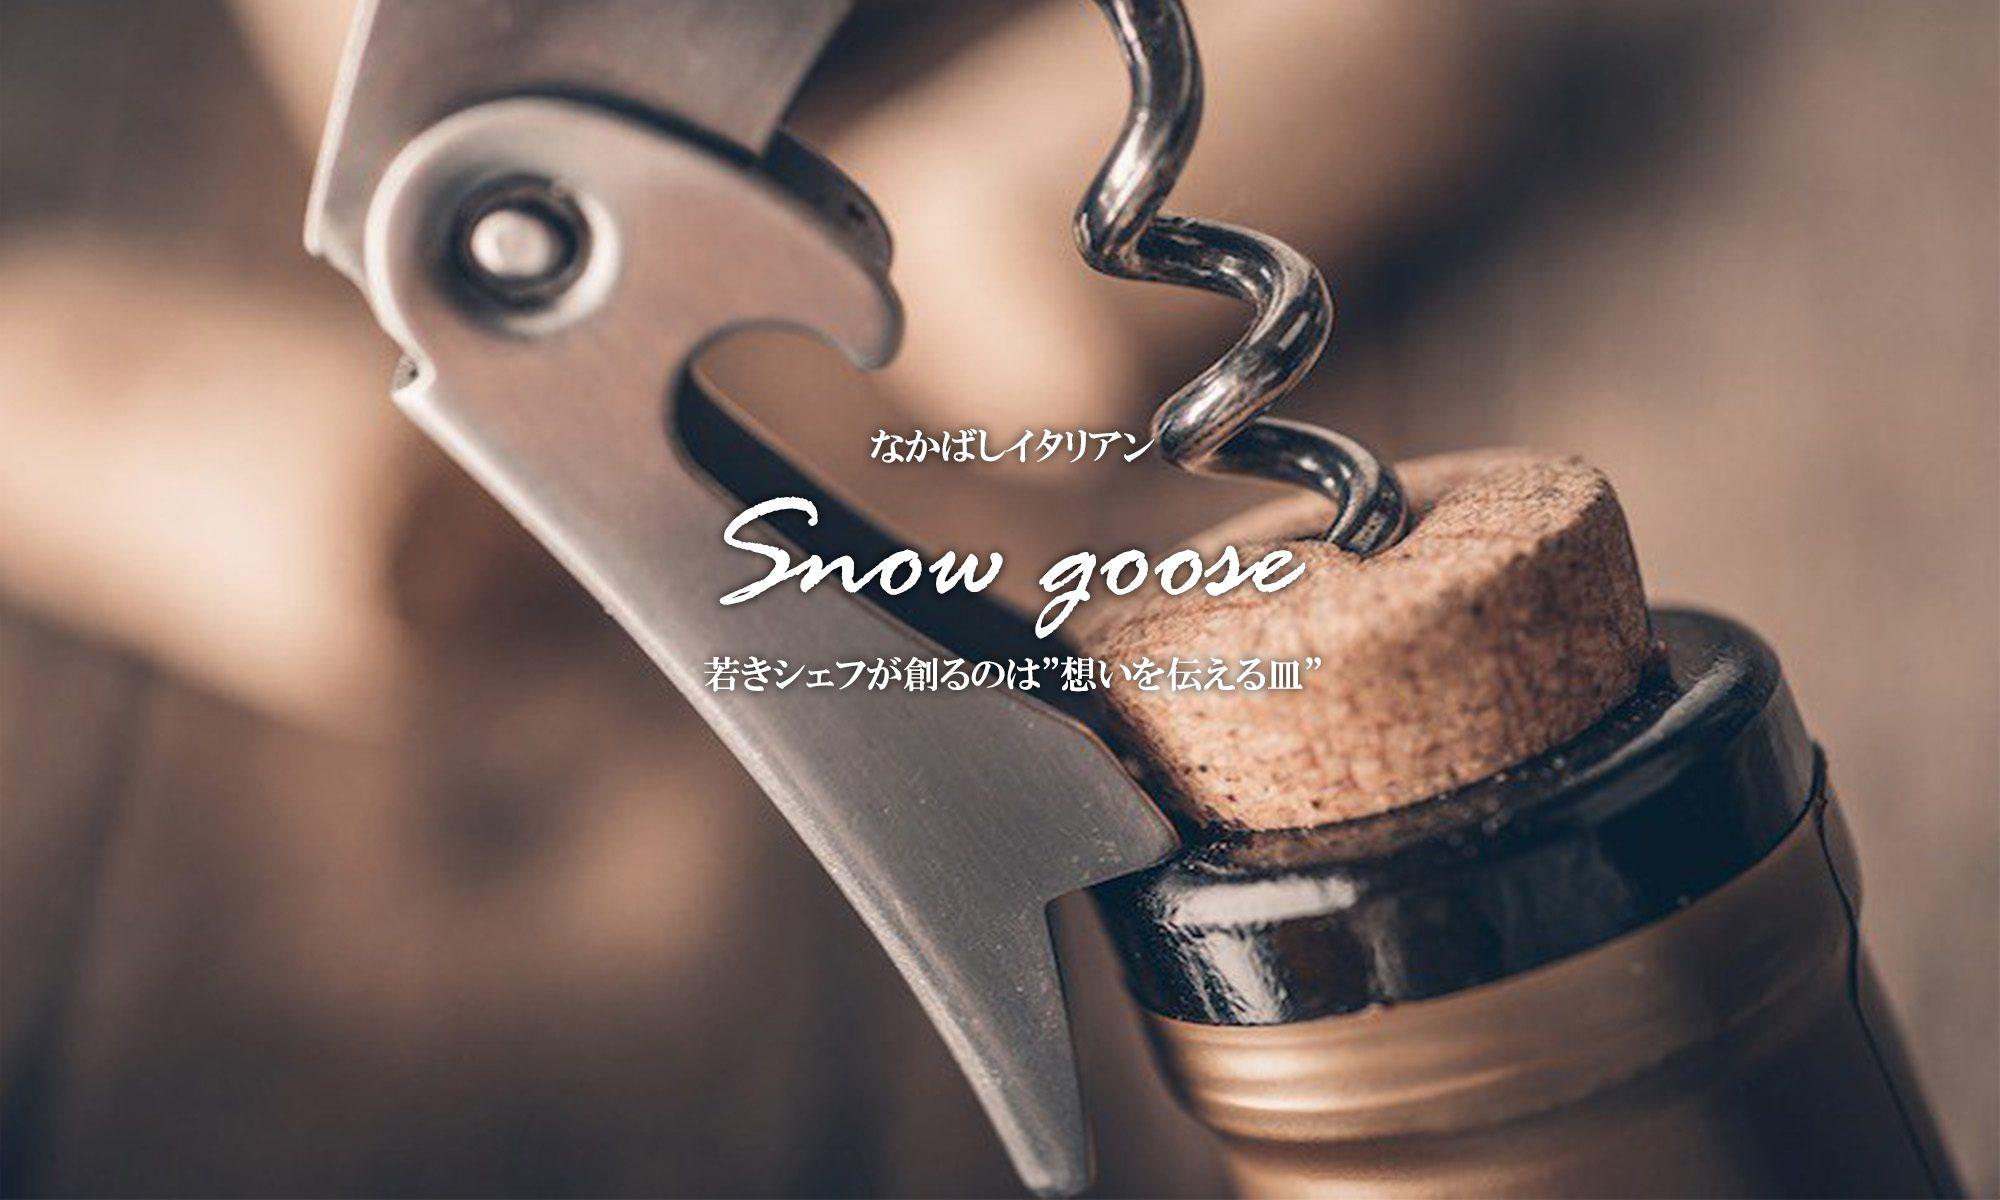 Snowgoose(スノーグース)